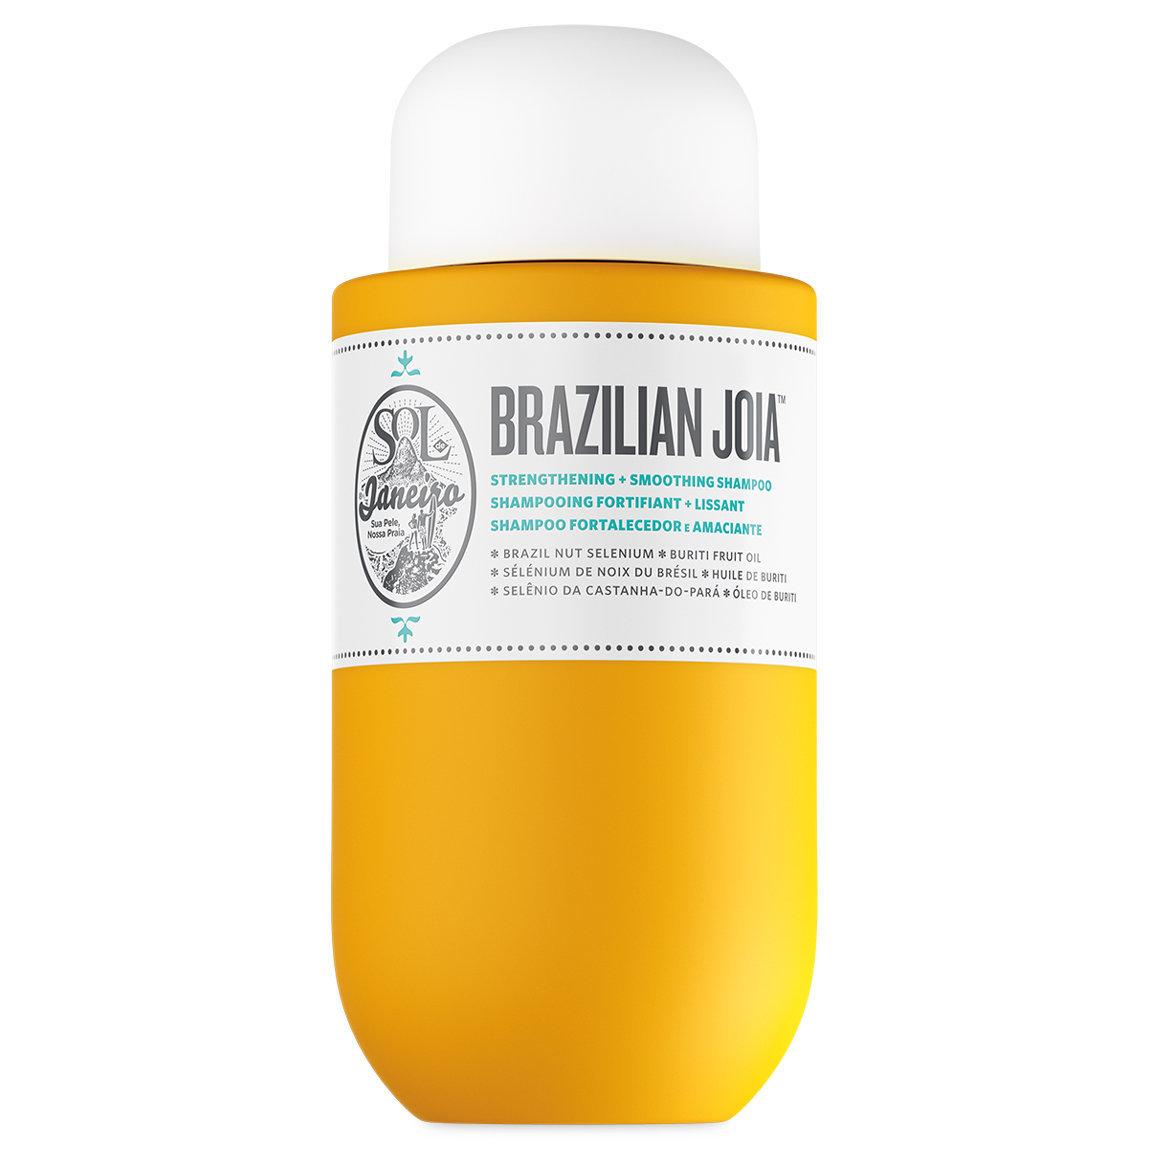 Sol de Janeiro Brazilian Joia Strengthening + Smoothing Shampoo product swatch.